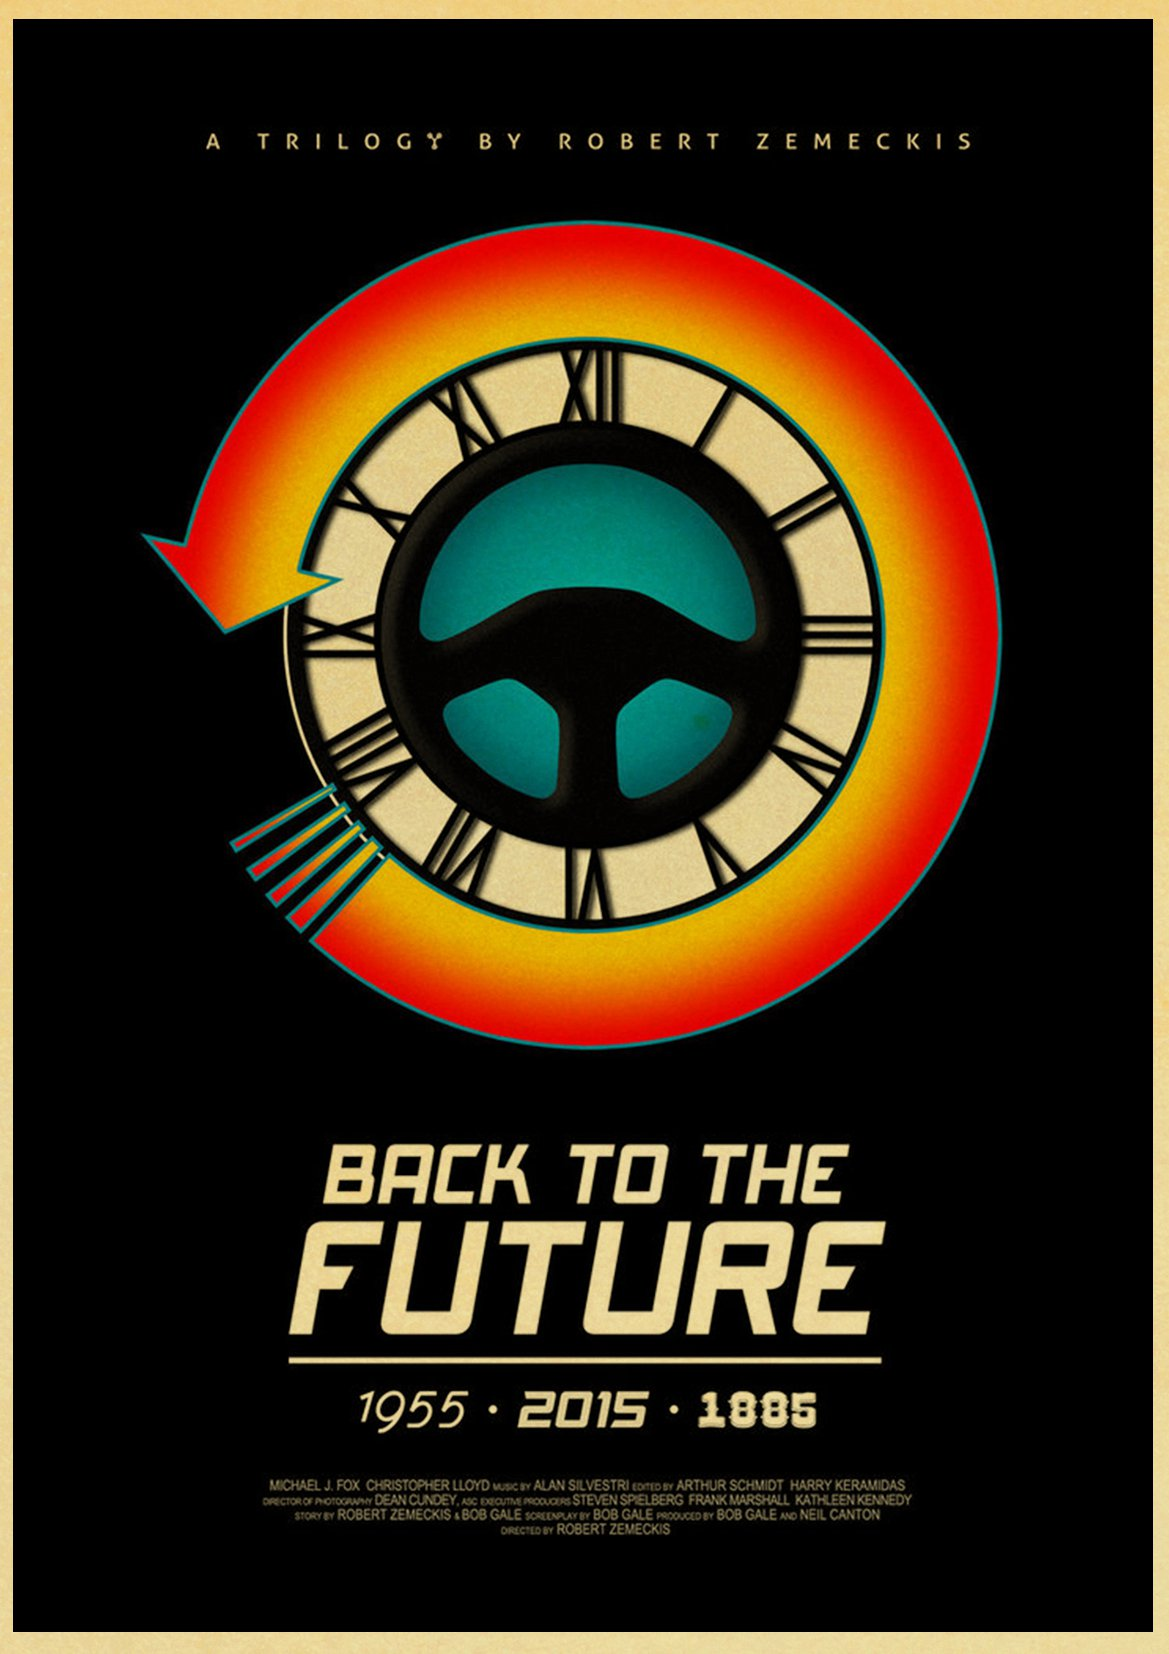 Sci fi Back to The Future Film Propaganda Retro Kraft Poster Decorative DIY Wall Canvas Sticker Sci-fi Back to The Future Film Propaganda Retro Kraft Poster Decorative DIY Wall Canvas Sticker Home Bar Art Posters Decor